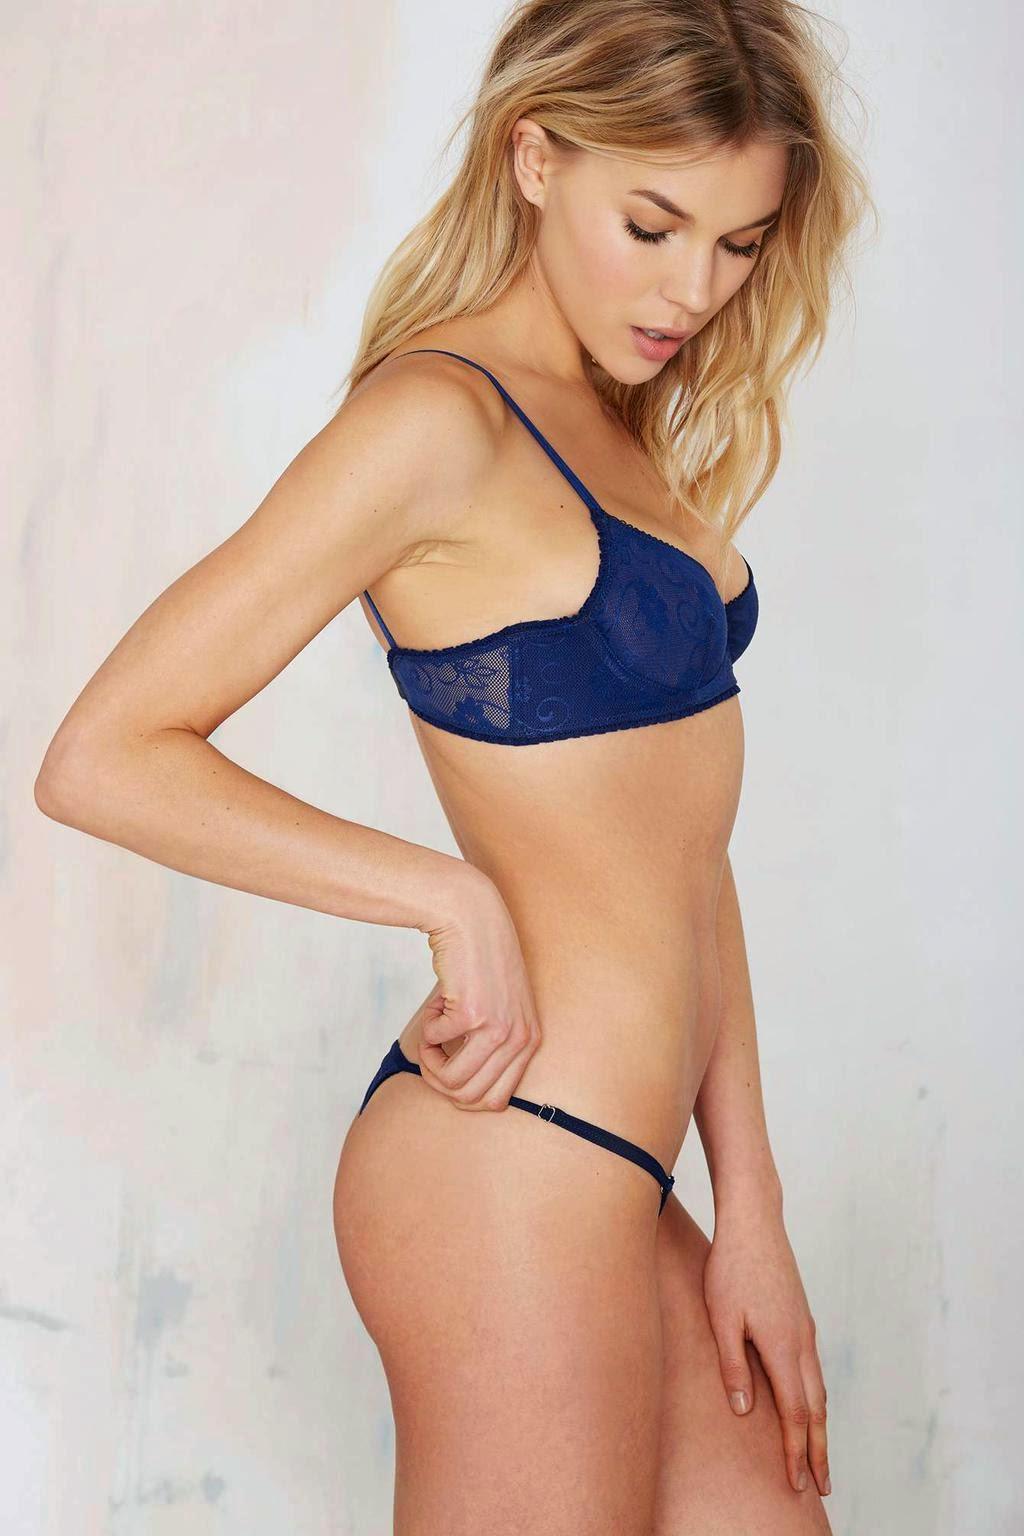 Britt Maren nudes (84 photos) Young, Snapchat, lingerie